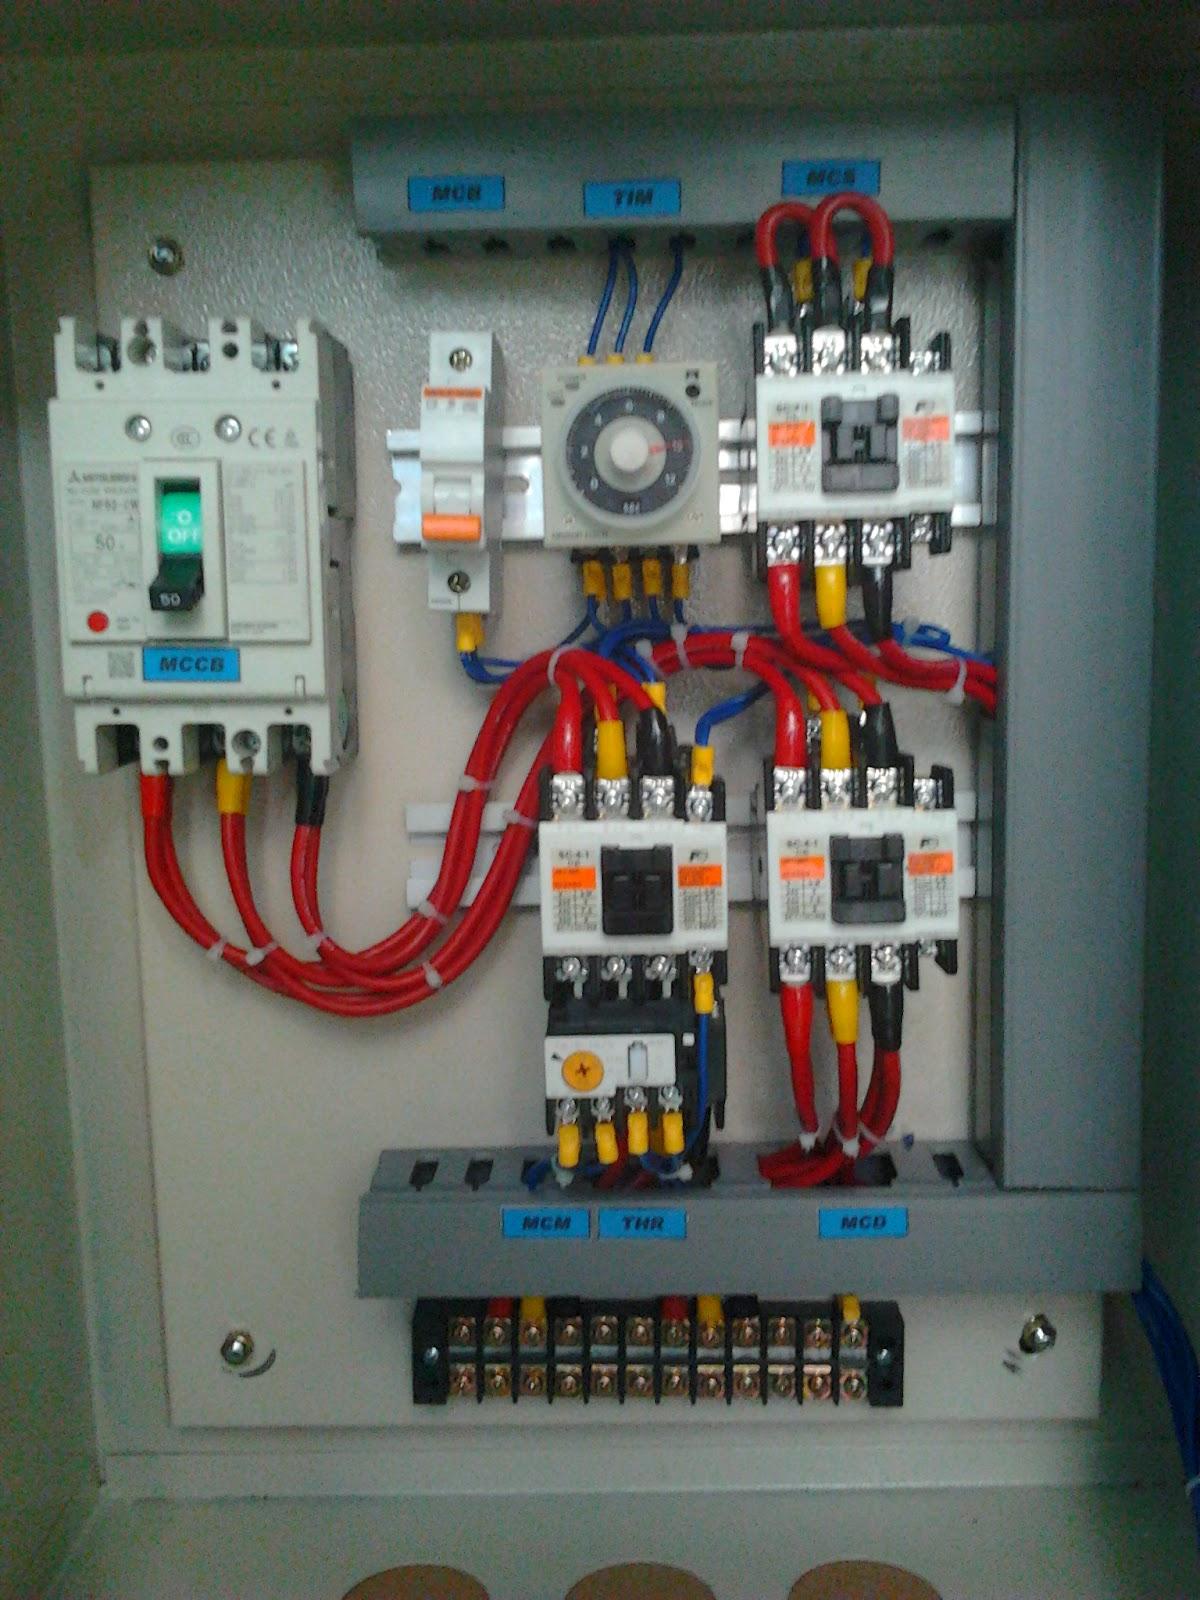 Wiring Diagram Panel Listrik 3 Phase : Cv aldy teknik banjarmasin panel star delta